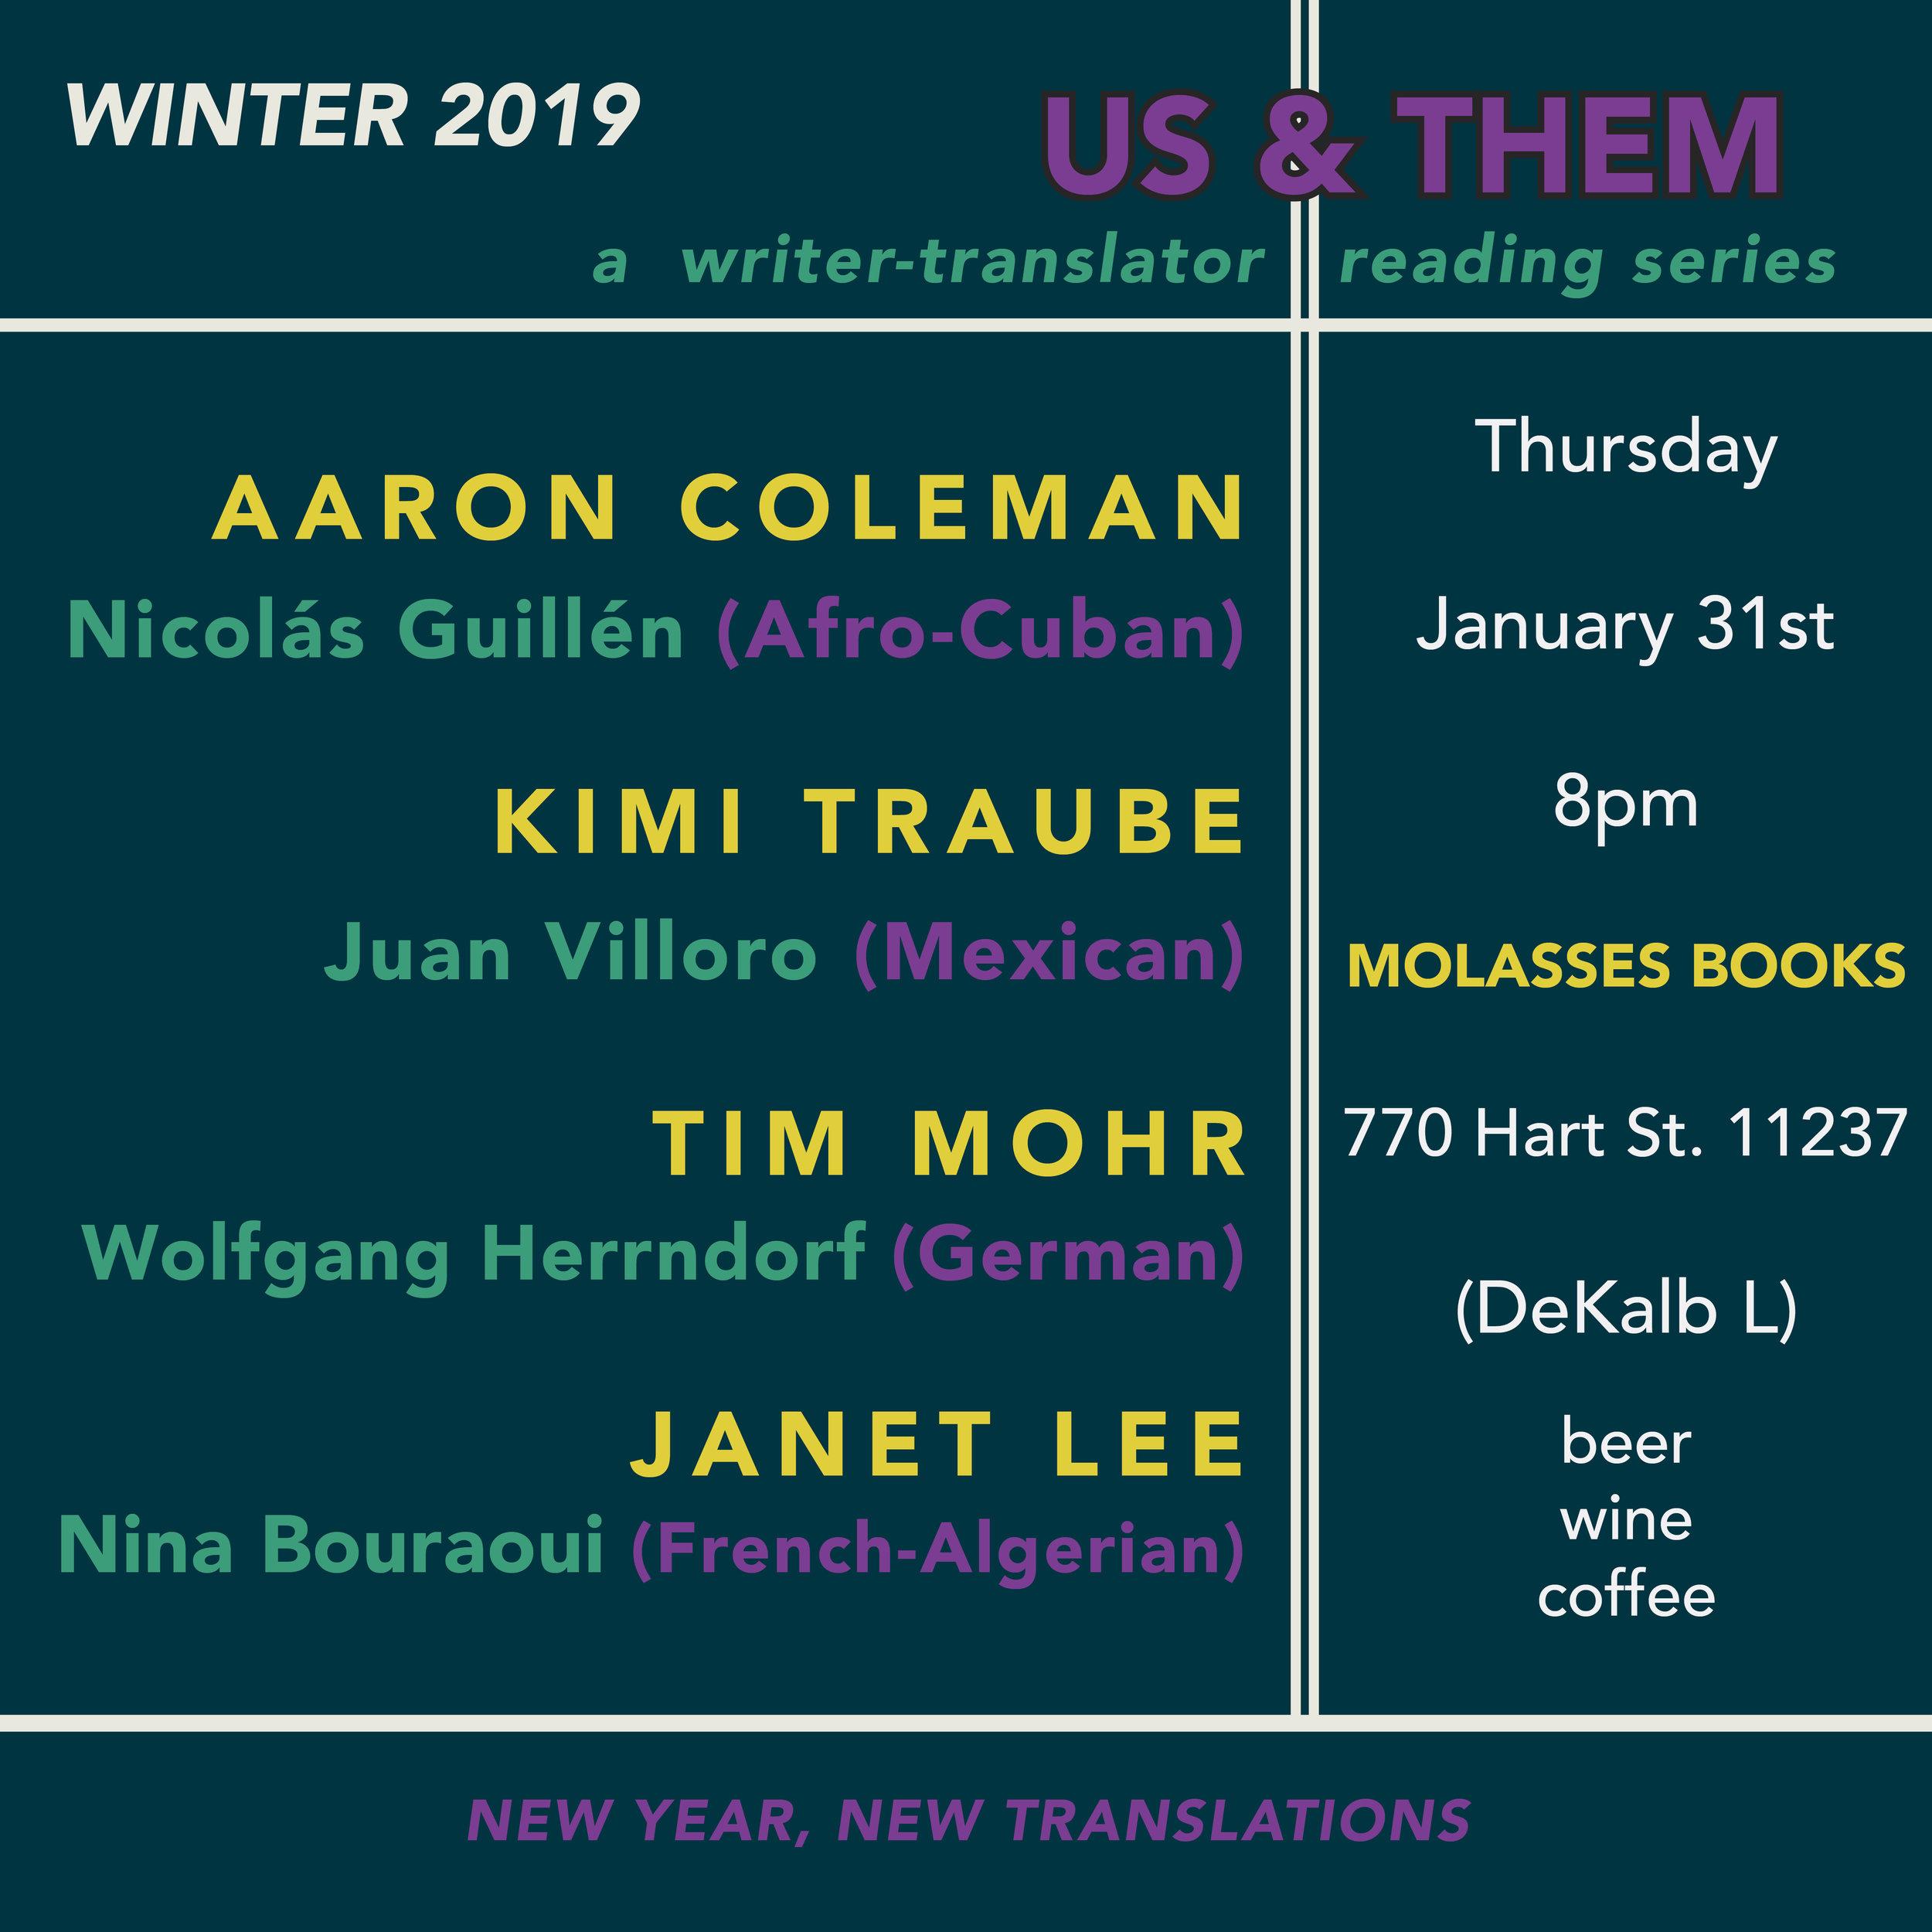 2019_Winter_Us&Them flyer_r1.jpg